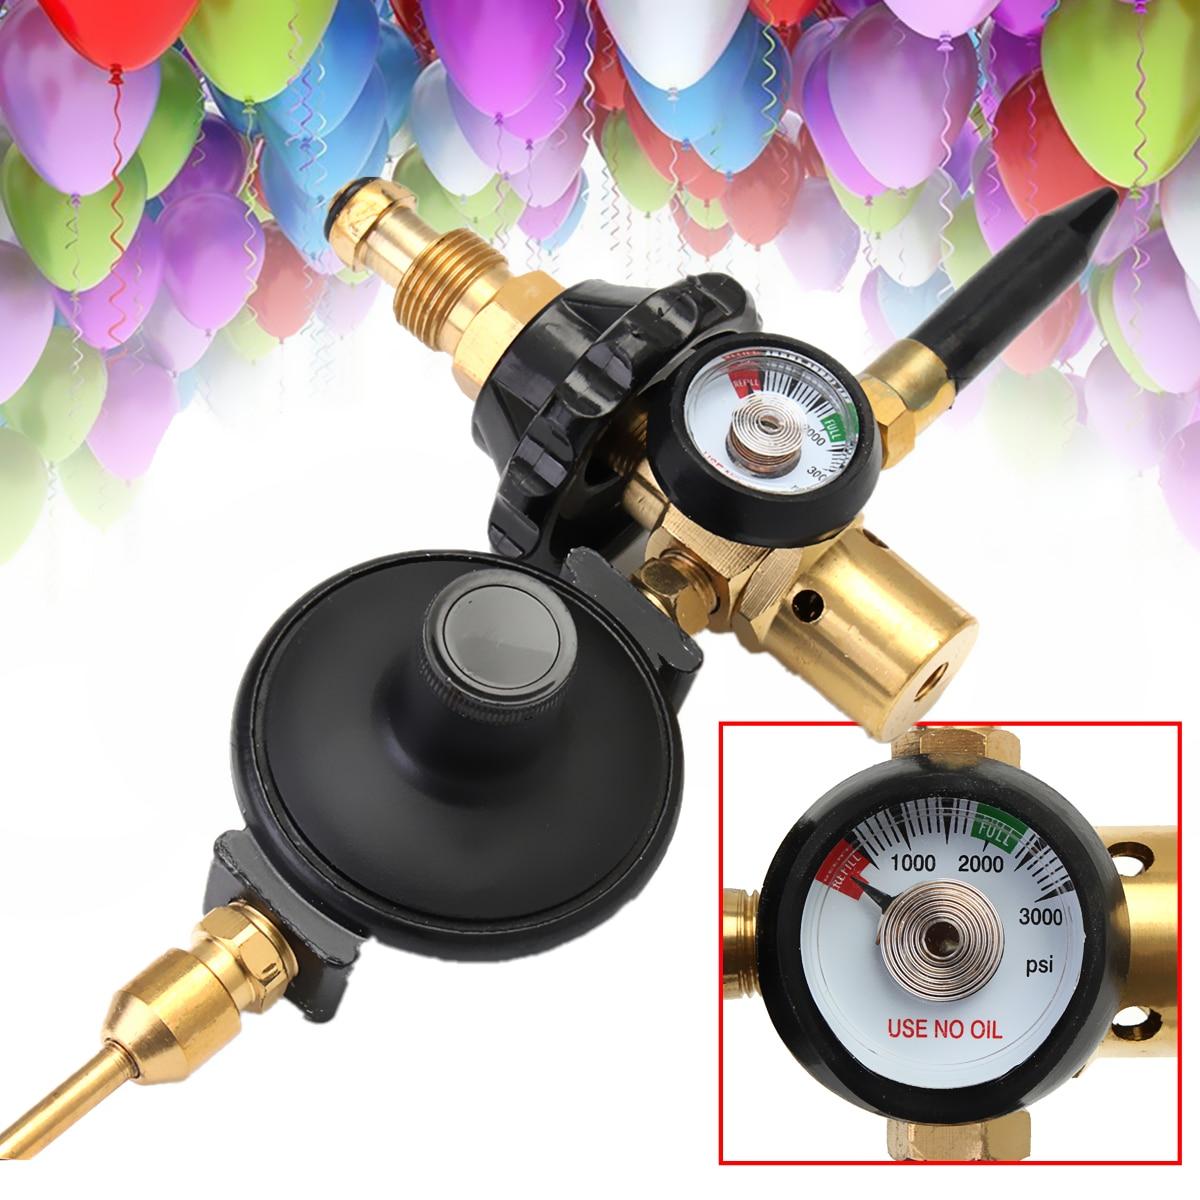 Helium Latex Balloon Air Flow Inflator Regulator Meter Gauge For G5/8 Tank Valve